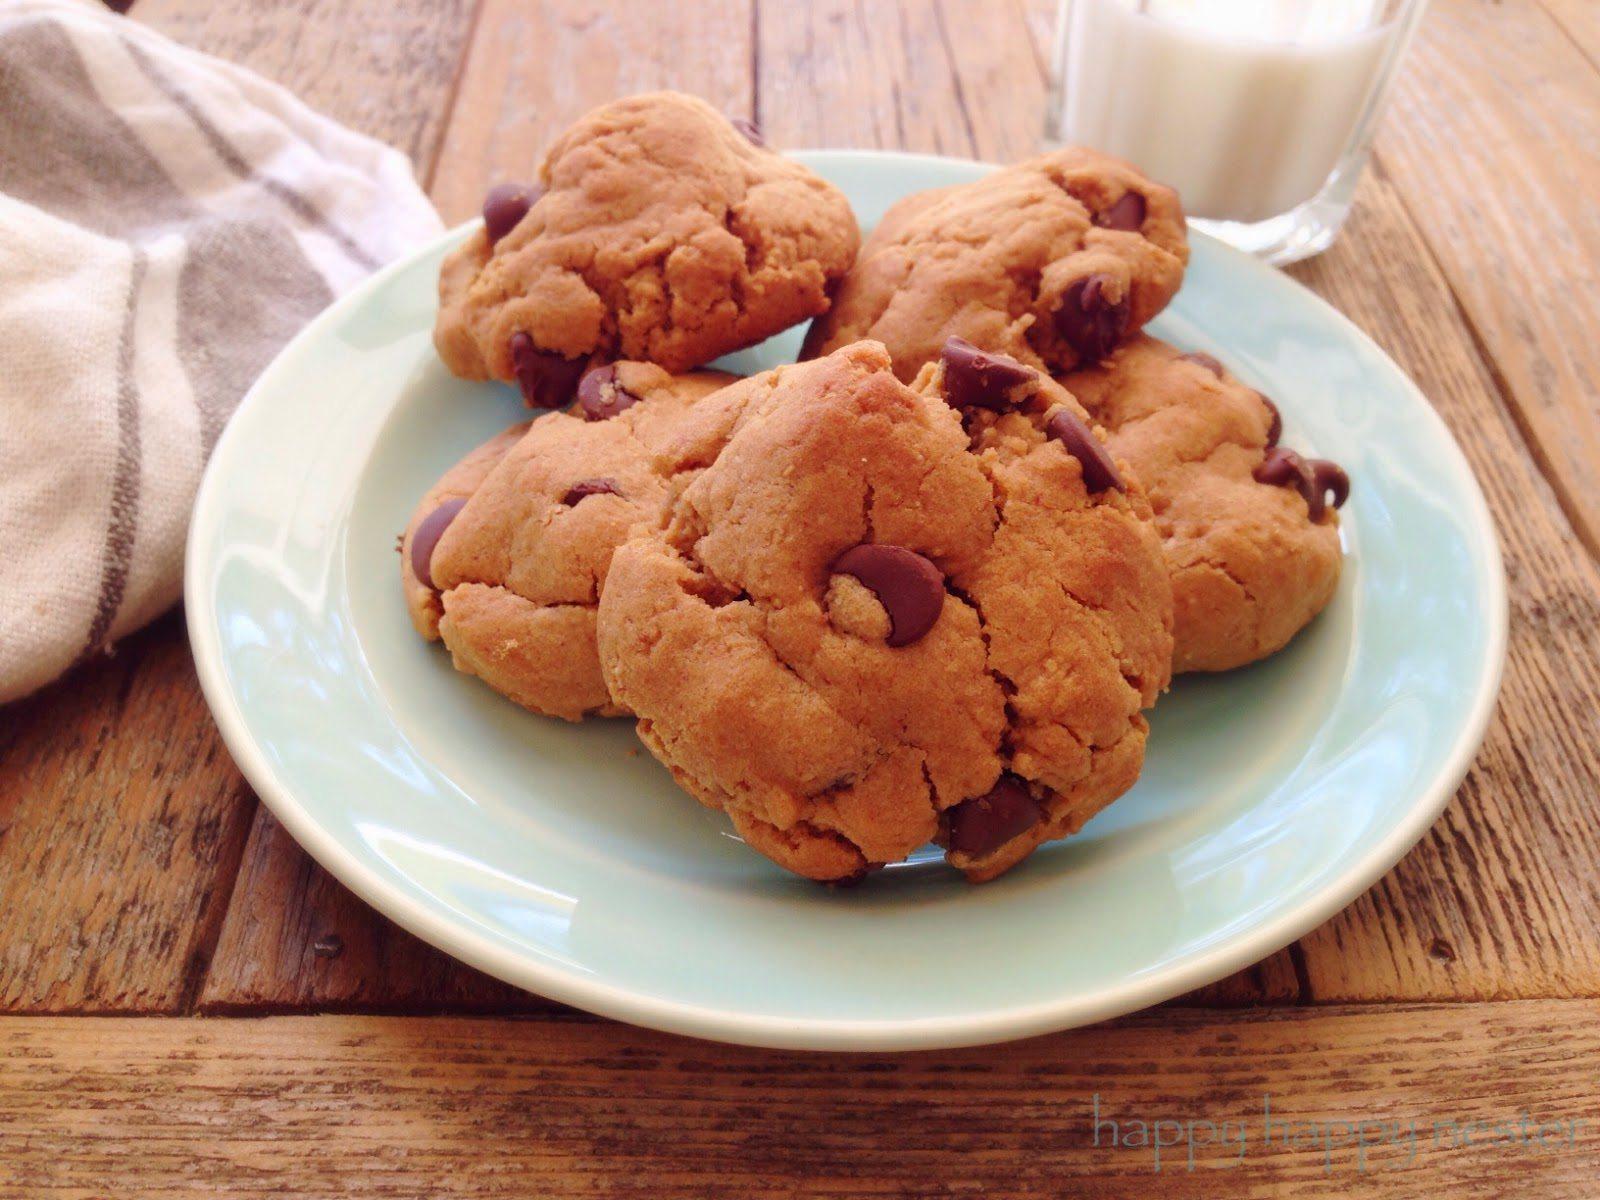 Gluten Free Peanut Butter Chocolate Chip Cookies